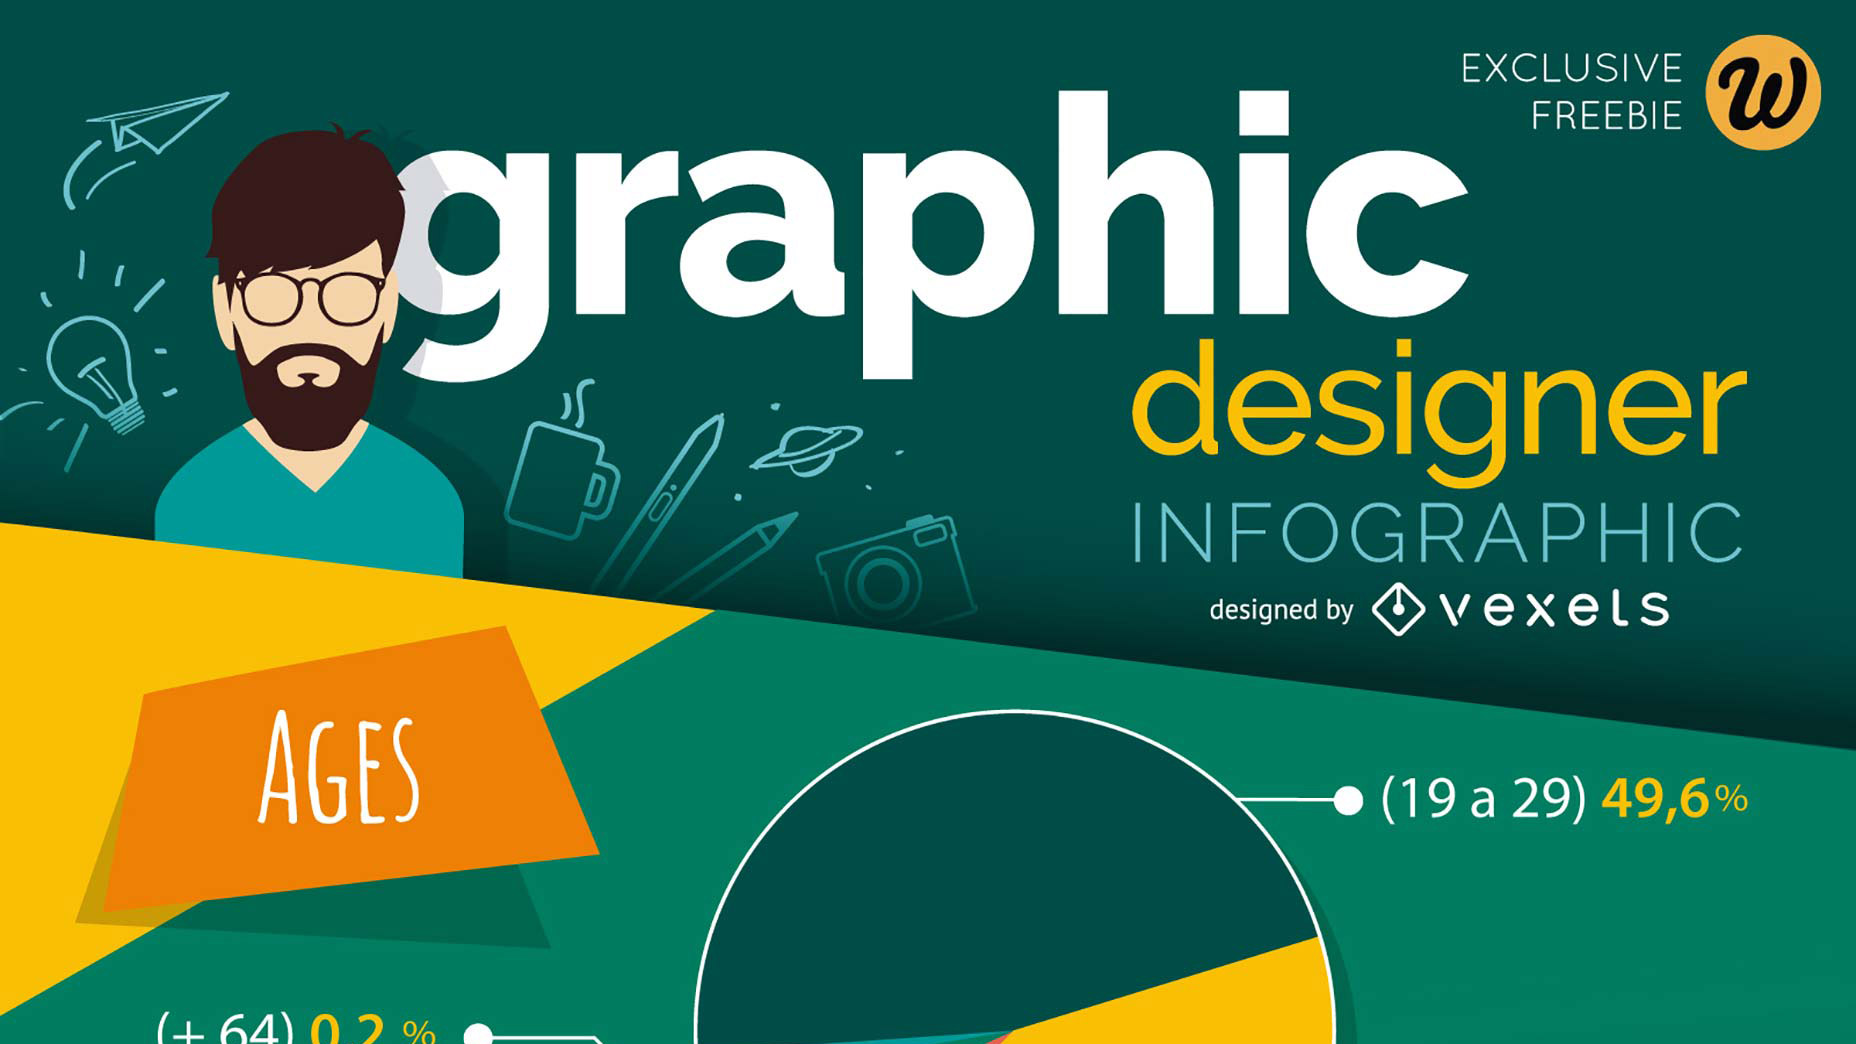 infographie-designer-graphique-traduction-lotincorp-featured